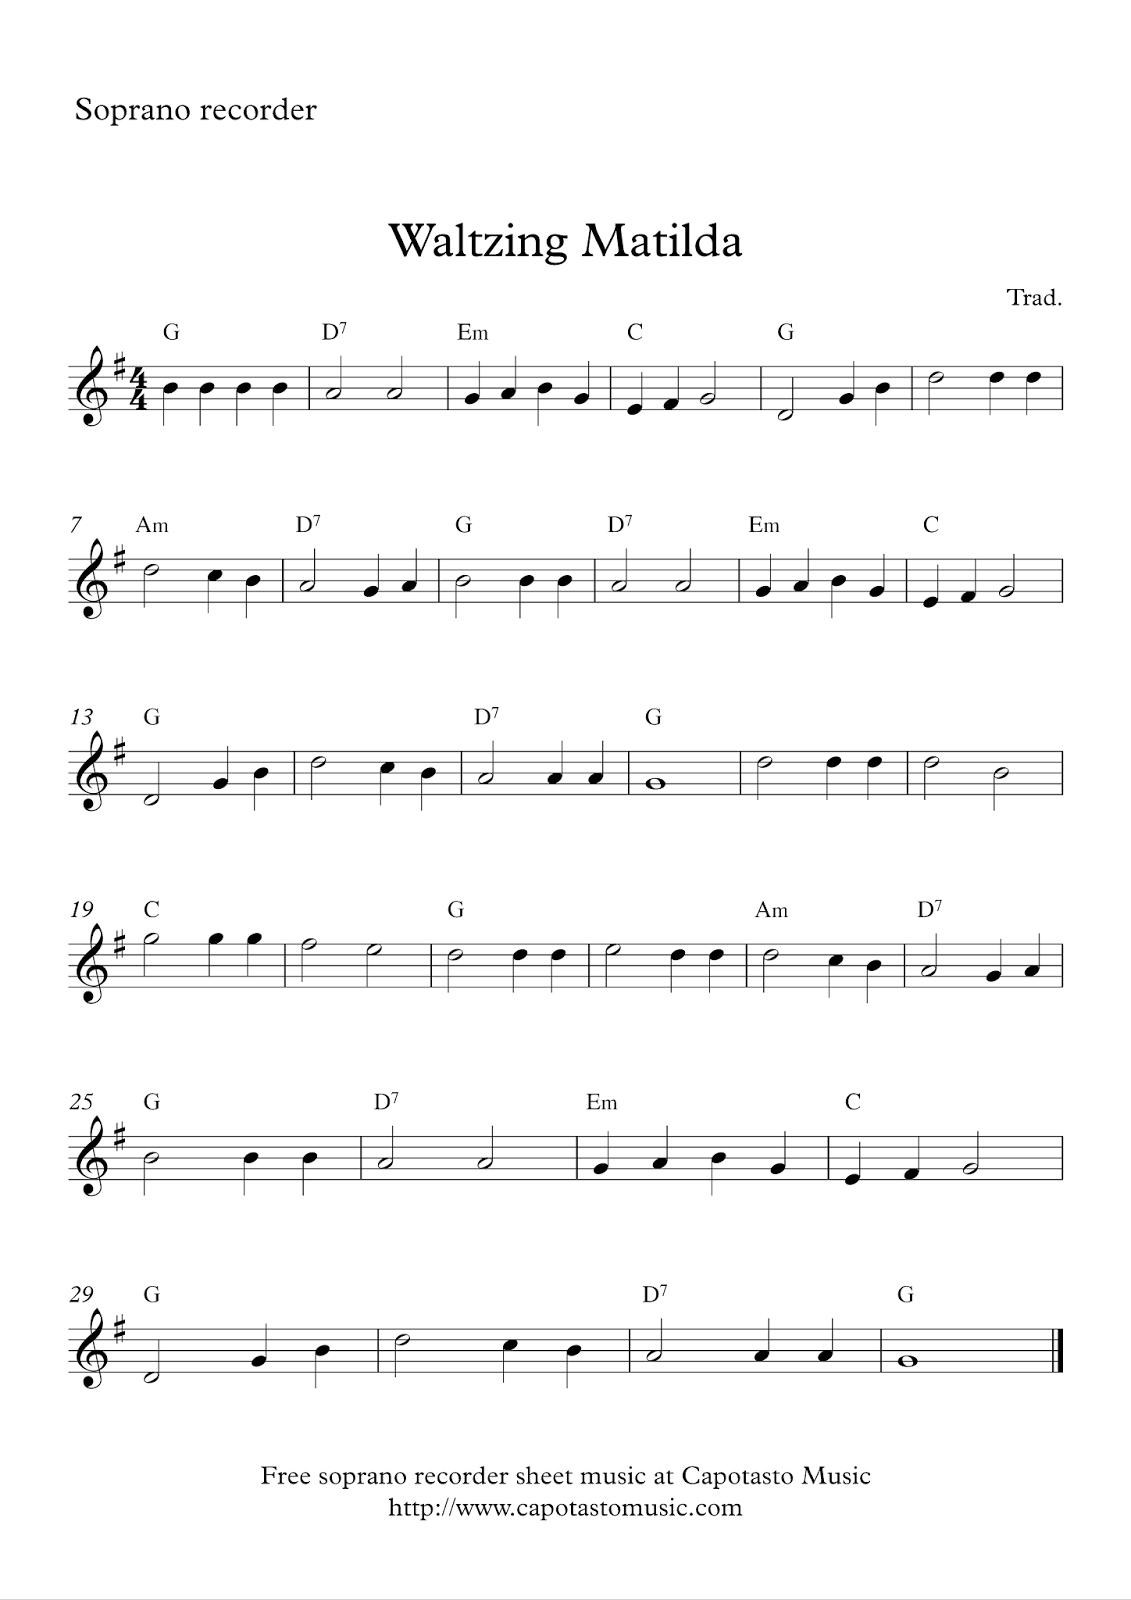 Free Easy Soprano Recorder Sheet Music, Waltzing Matilda - Free Printable Recorder Sheet Music For Beginners